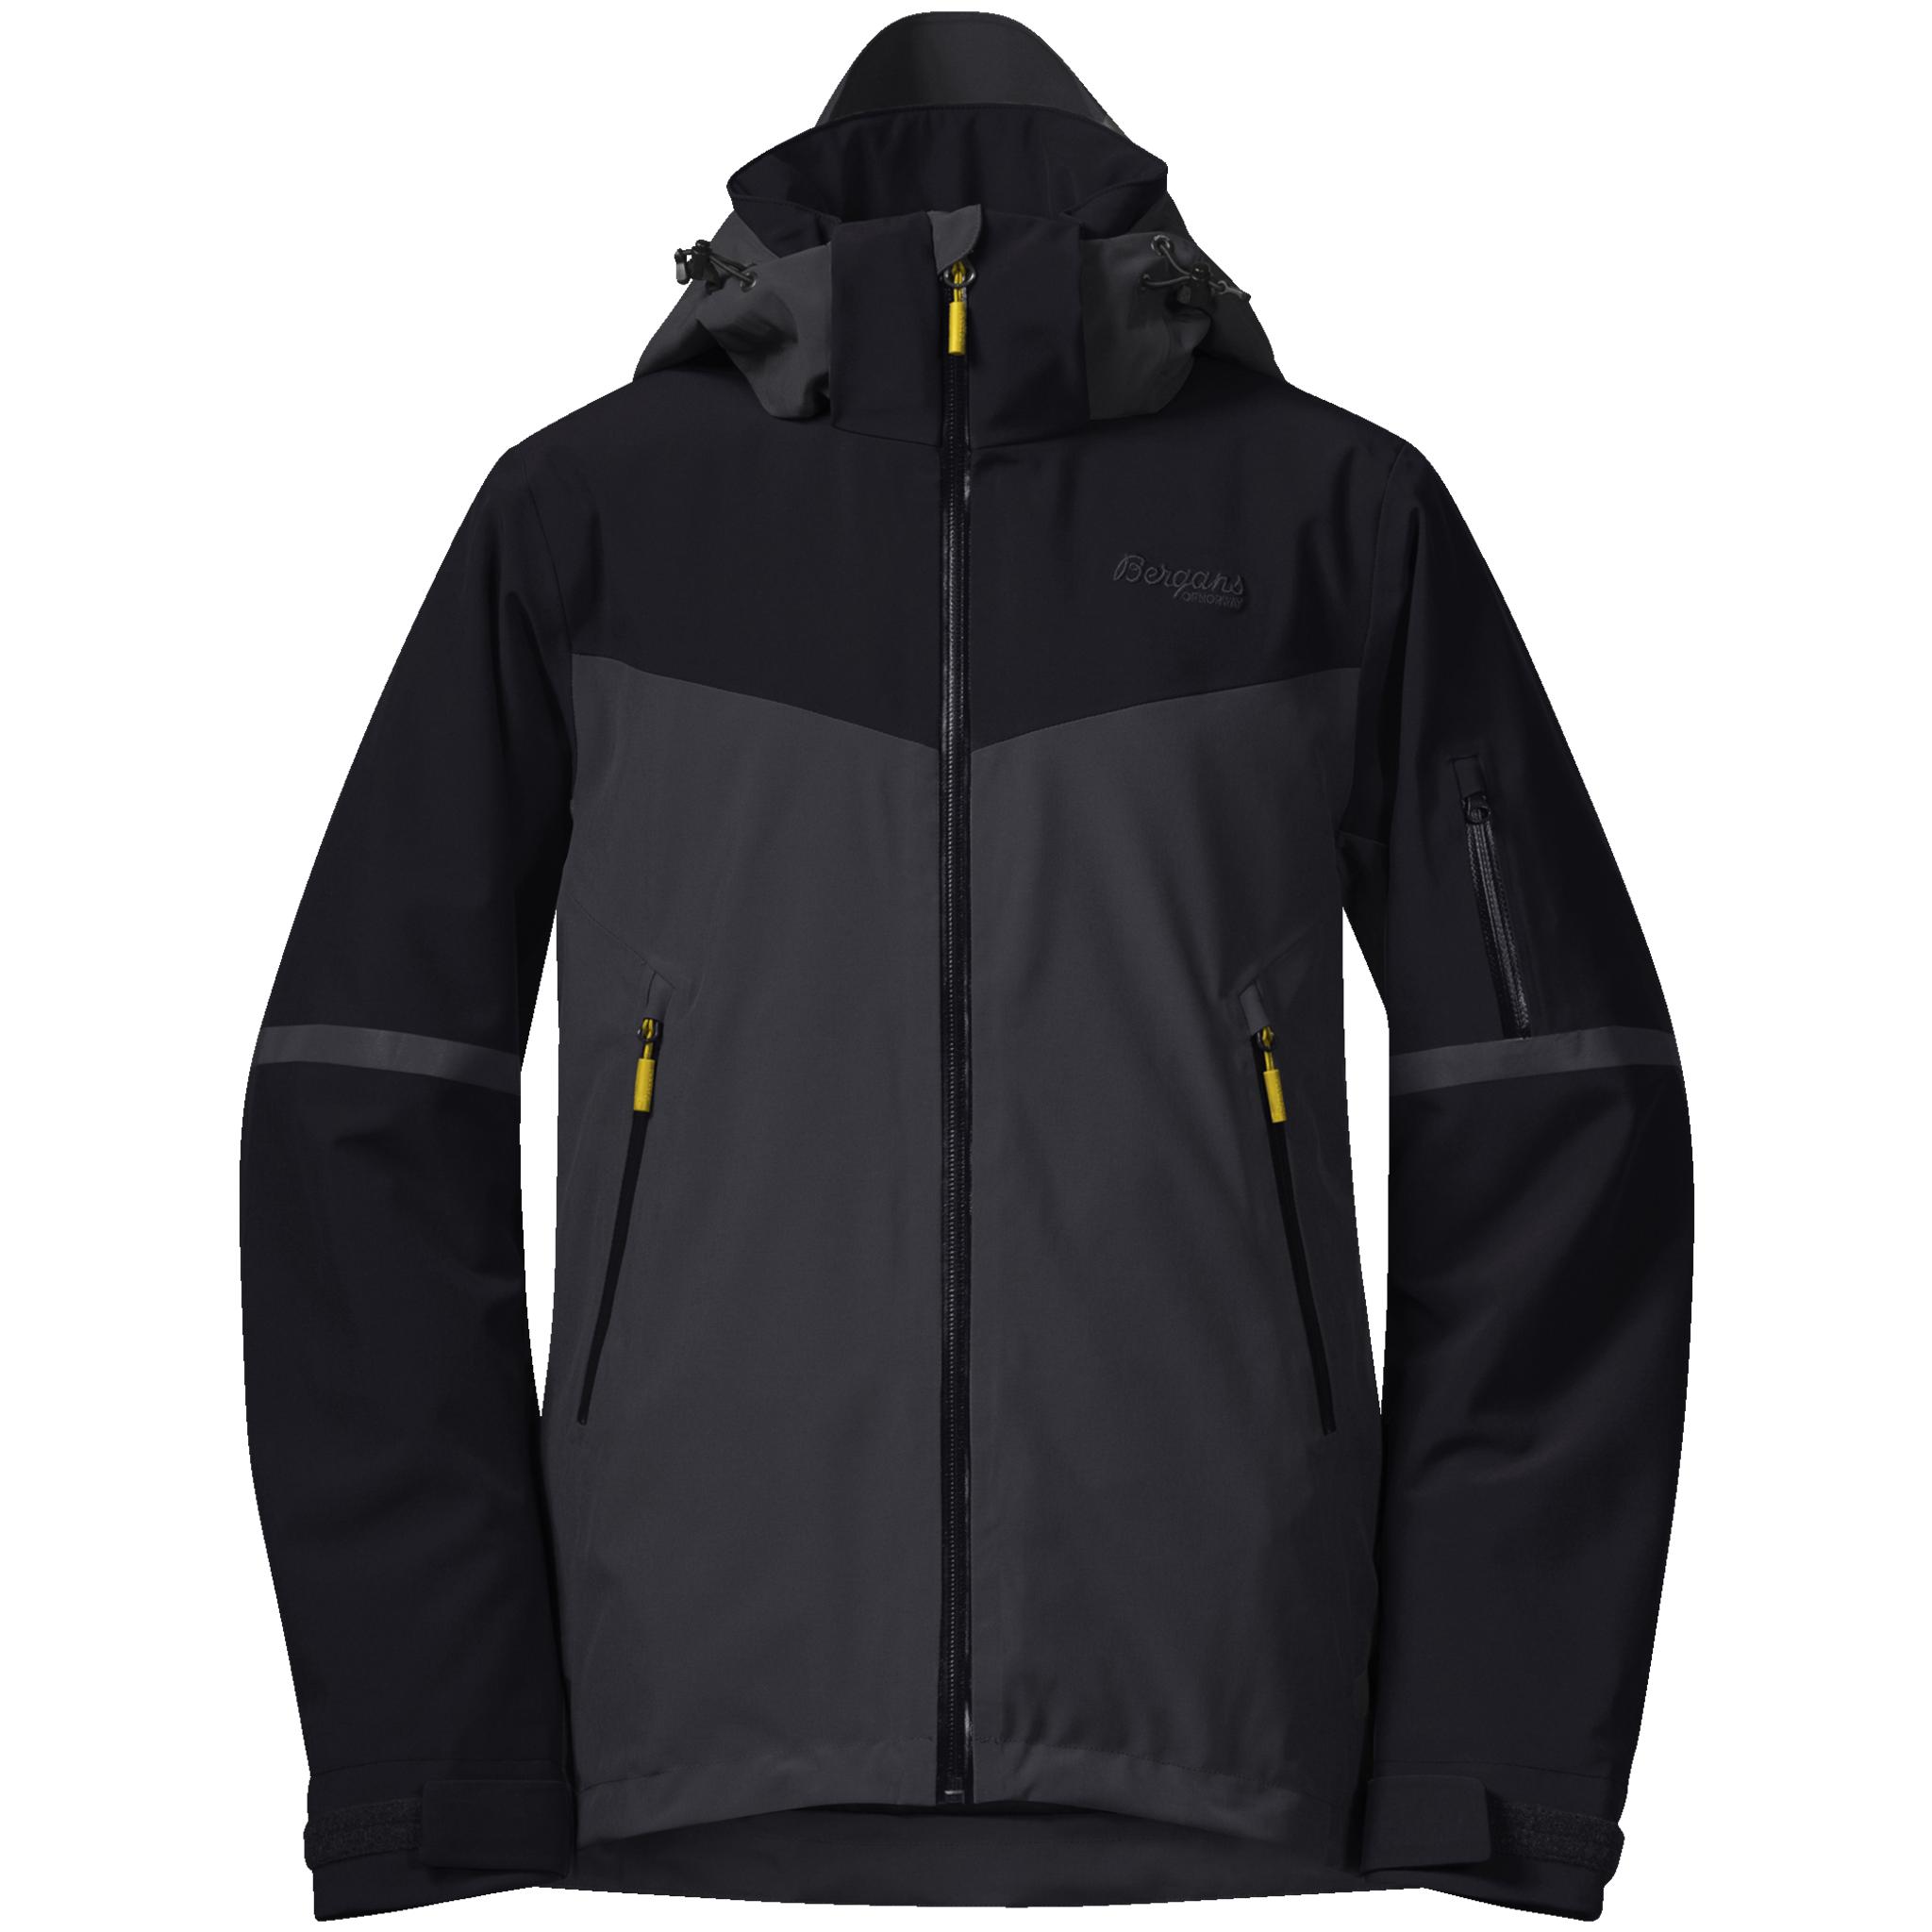 Bergans Oppdal Insulated Jacket, skijakke junior 128 Black/Solidcharcoal/